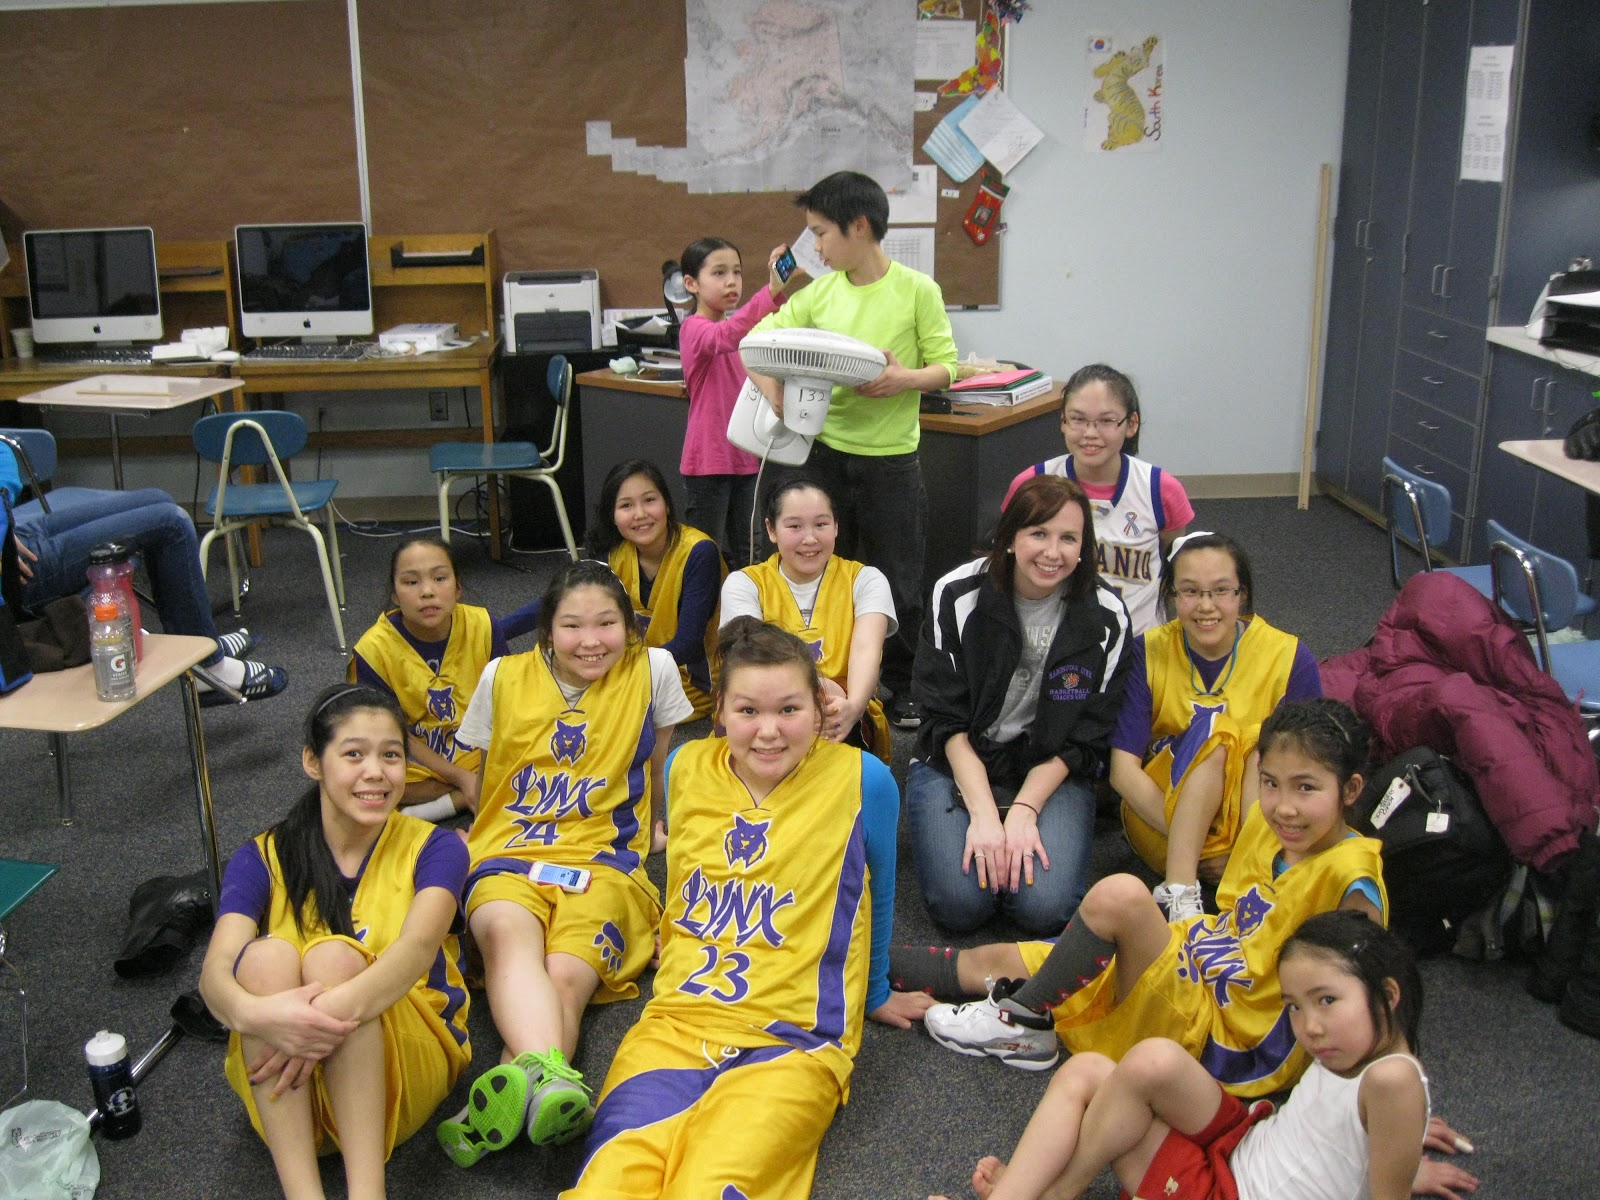 manokotak girls Chugiak girls, dimond boys claim berths in class 4a state basketball tourney author: alaska news manokotak vs teller 9:45 am.